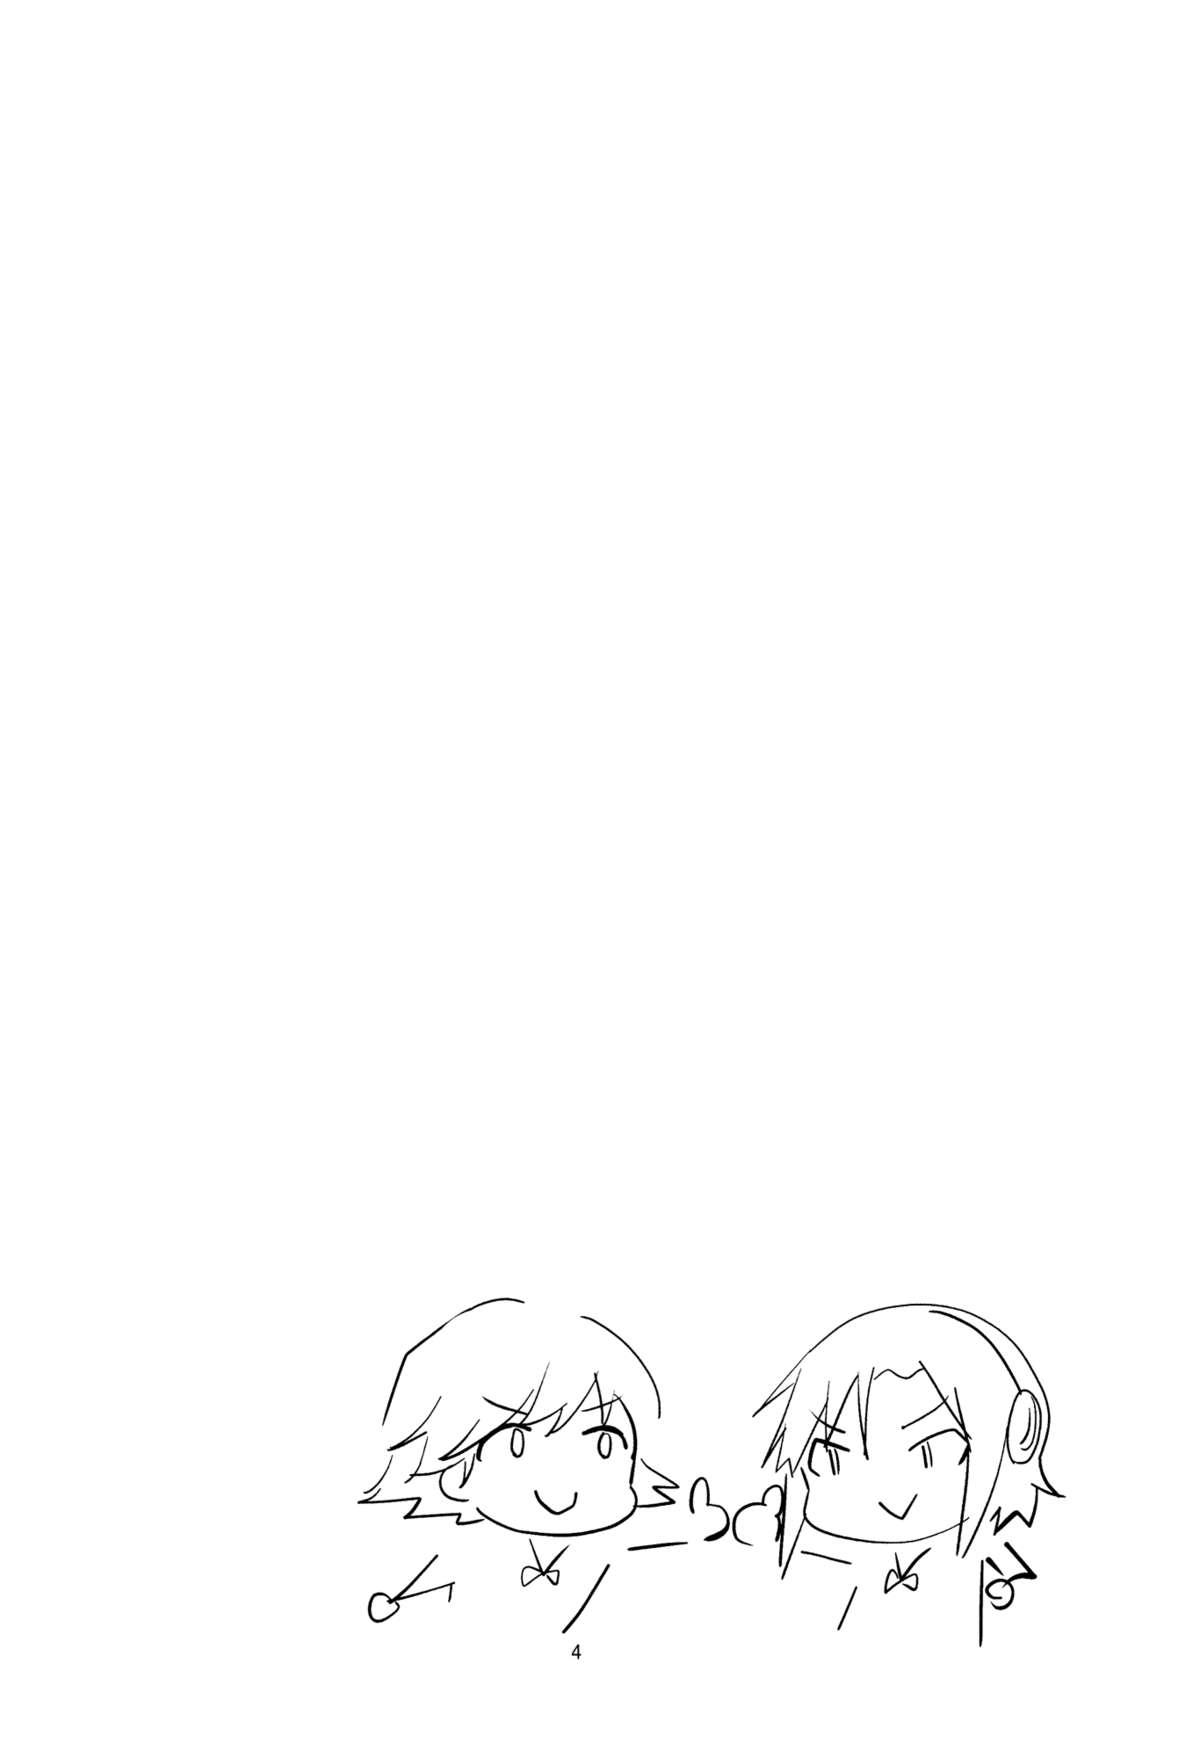 (SC2015 Winter) [Itsusuba no Clover (Kamizaki Yotsuba)] Kaede-san no Nana Ijiri   Kaede-san's Teasing of Nana (THE IDOLM@STER CINDERELLA GIRLS) [English] [Yuri-ism] 2